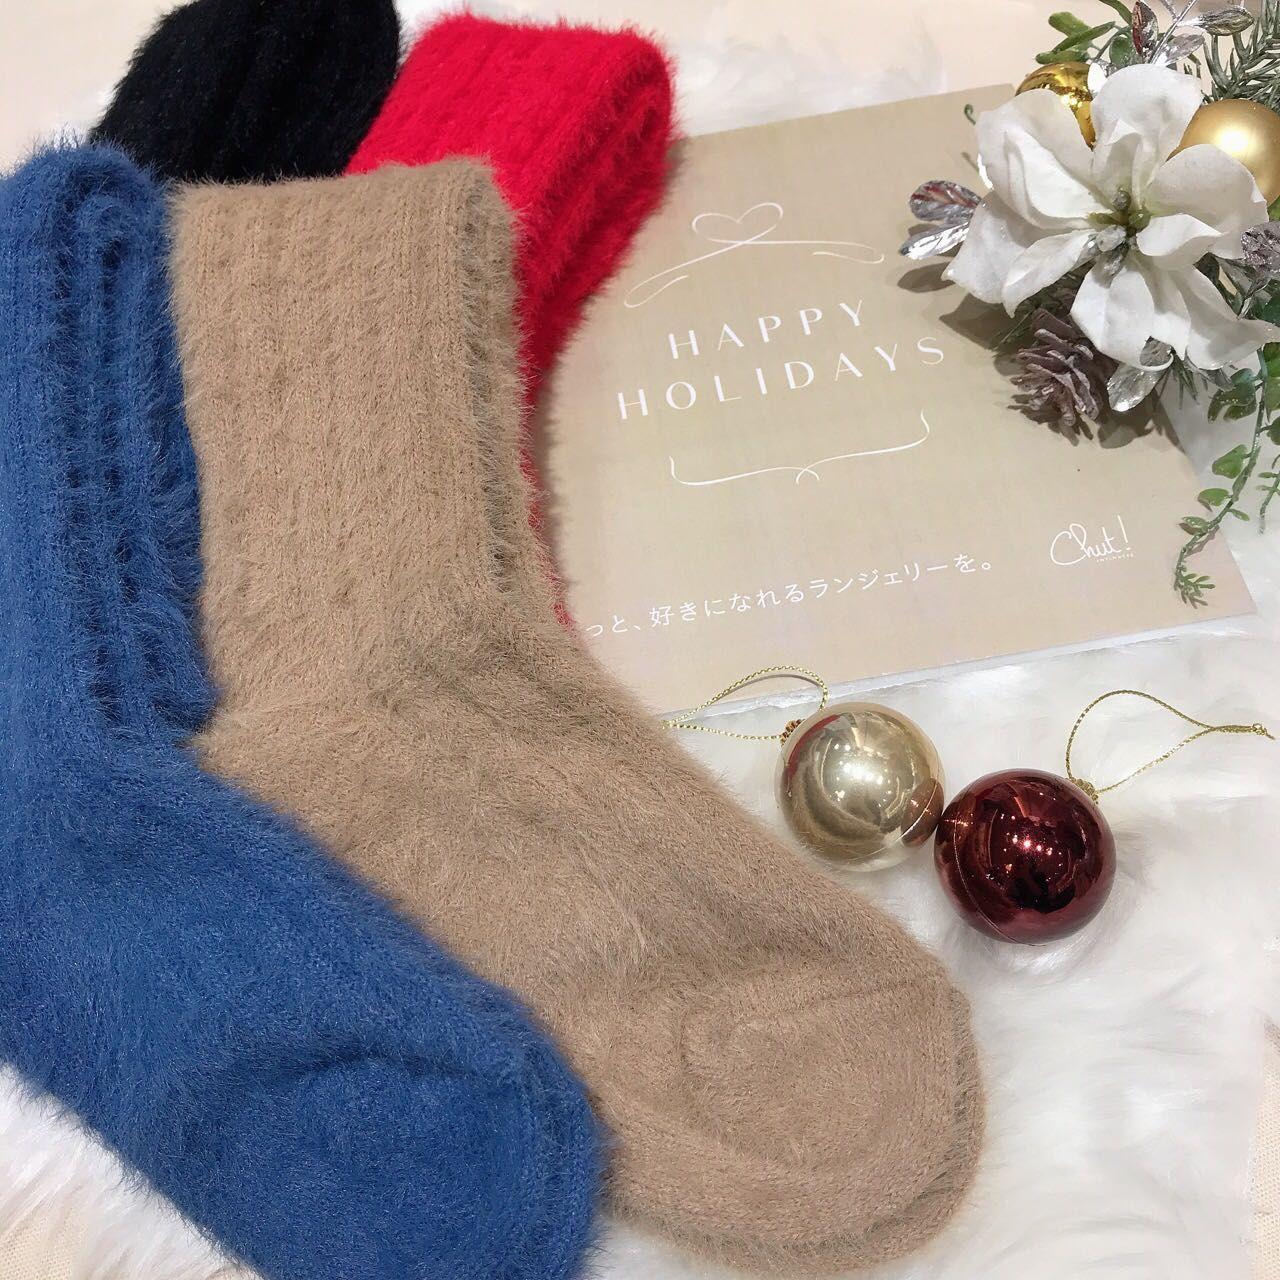 Chut!からオリジナル靴下プレゼント☆【イオンモール岡山店】の写真